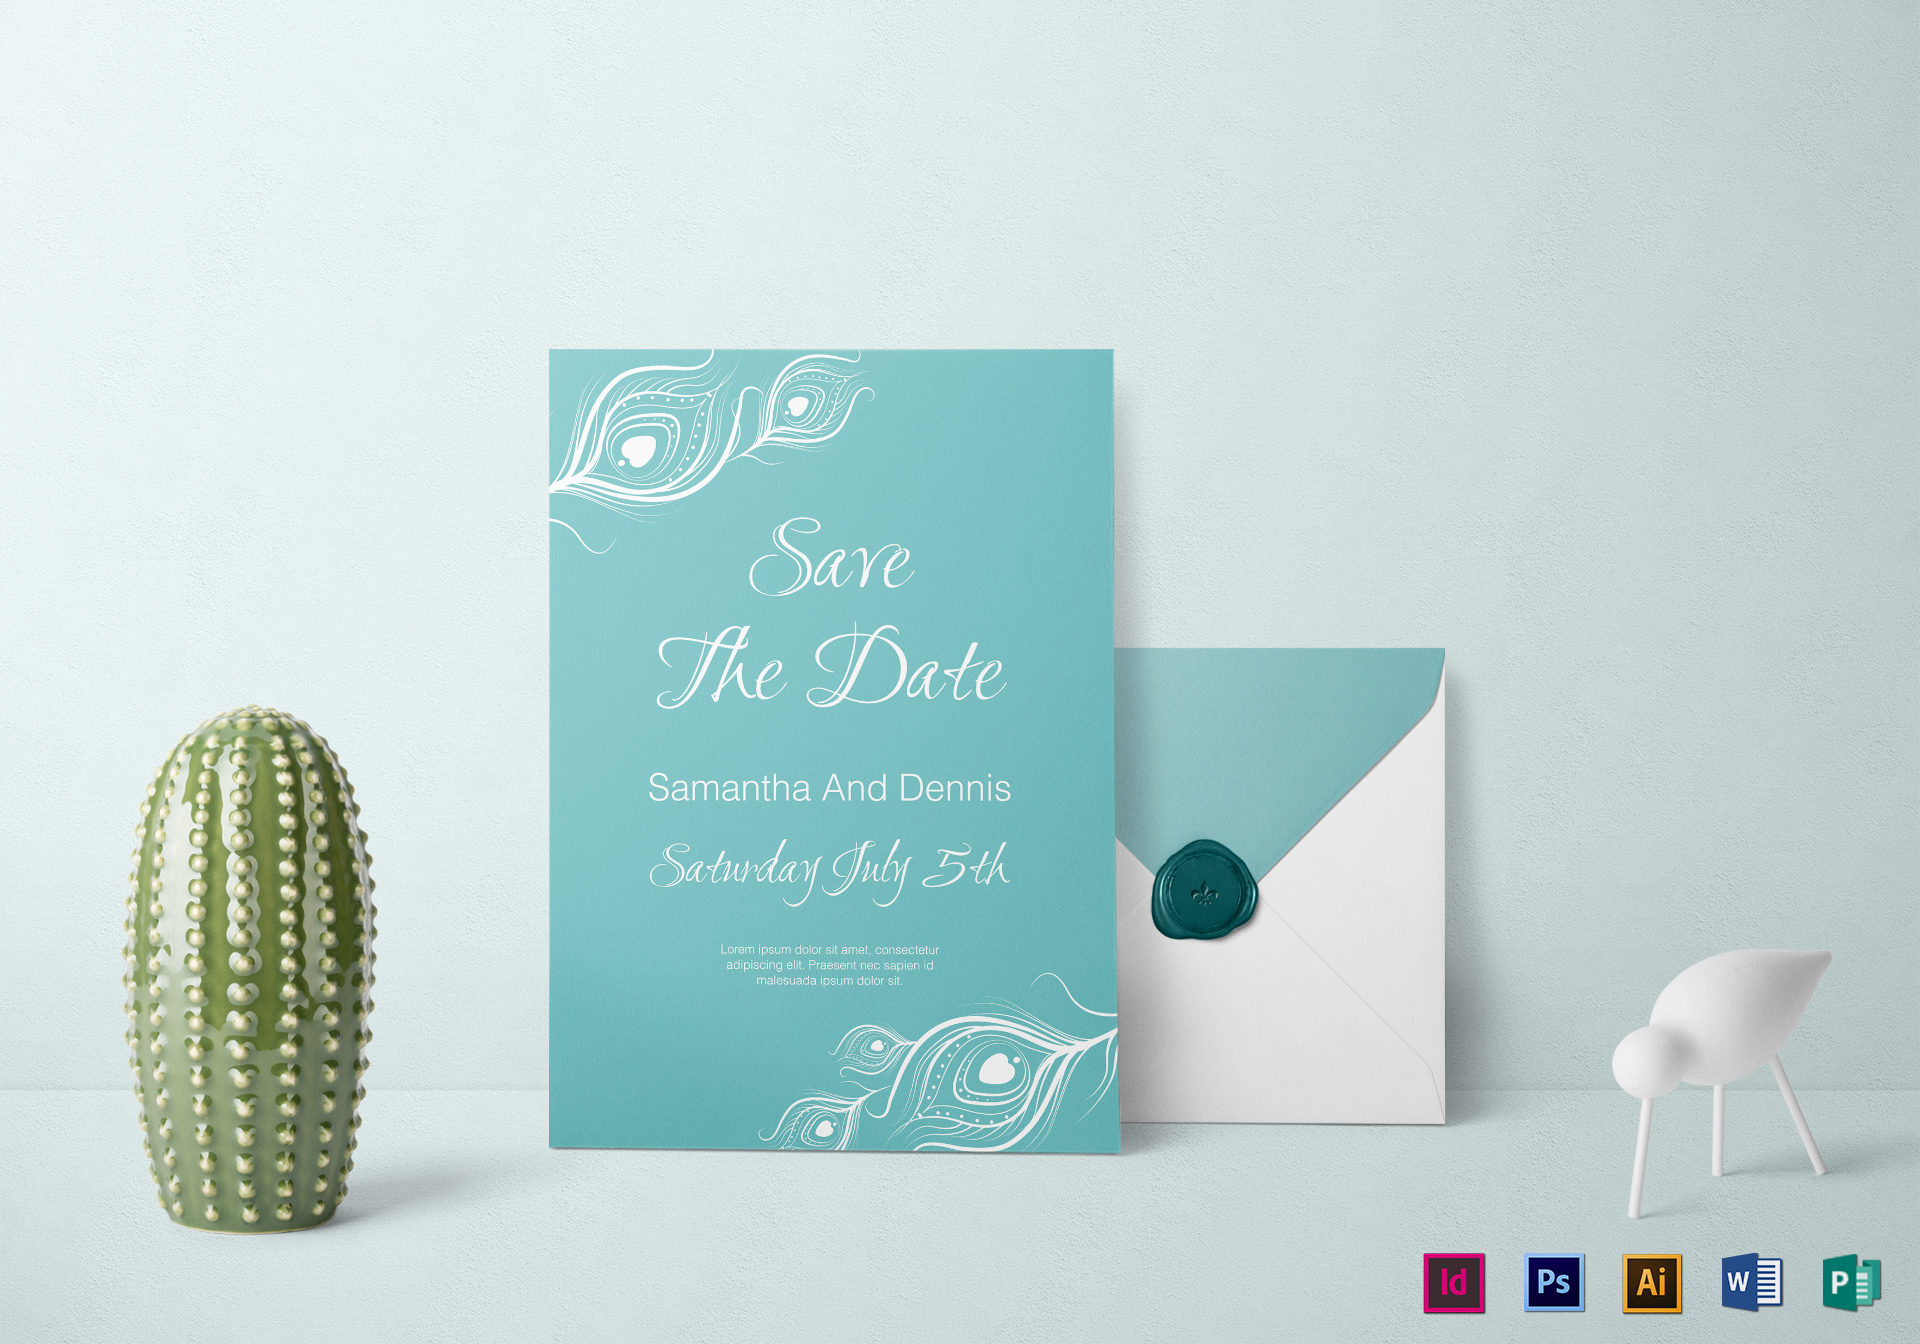 Peacock Wedding Invitations Template: Elegant Peacock Wedding Invitation Design Template In PSD